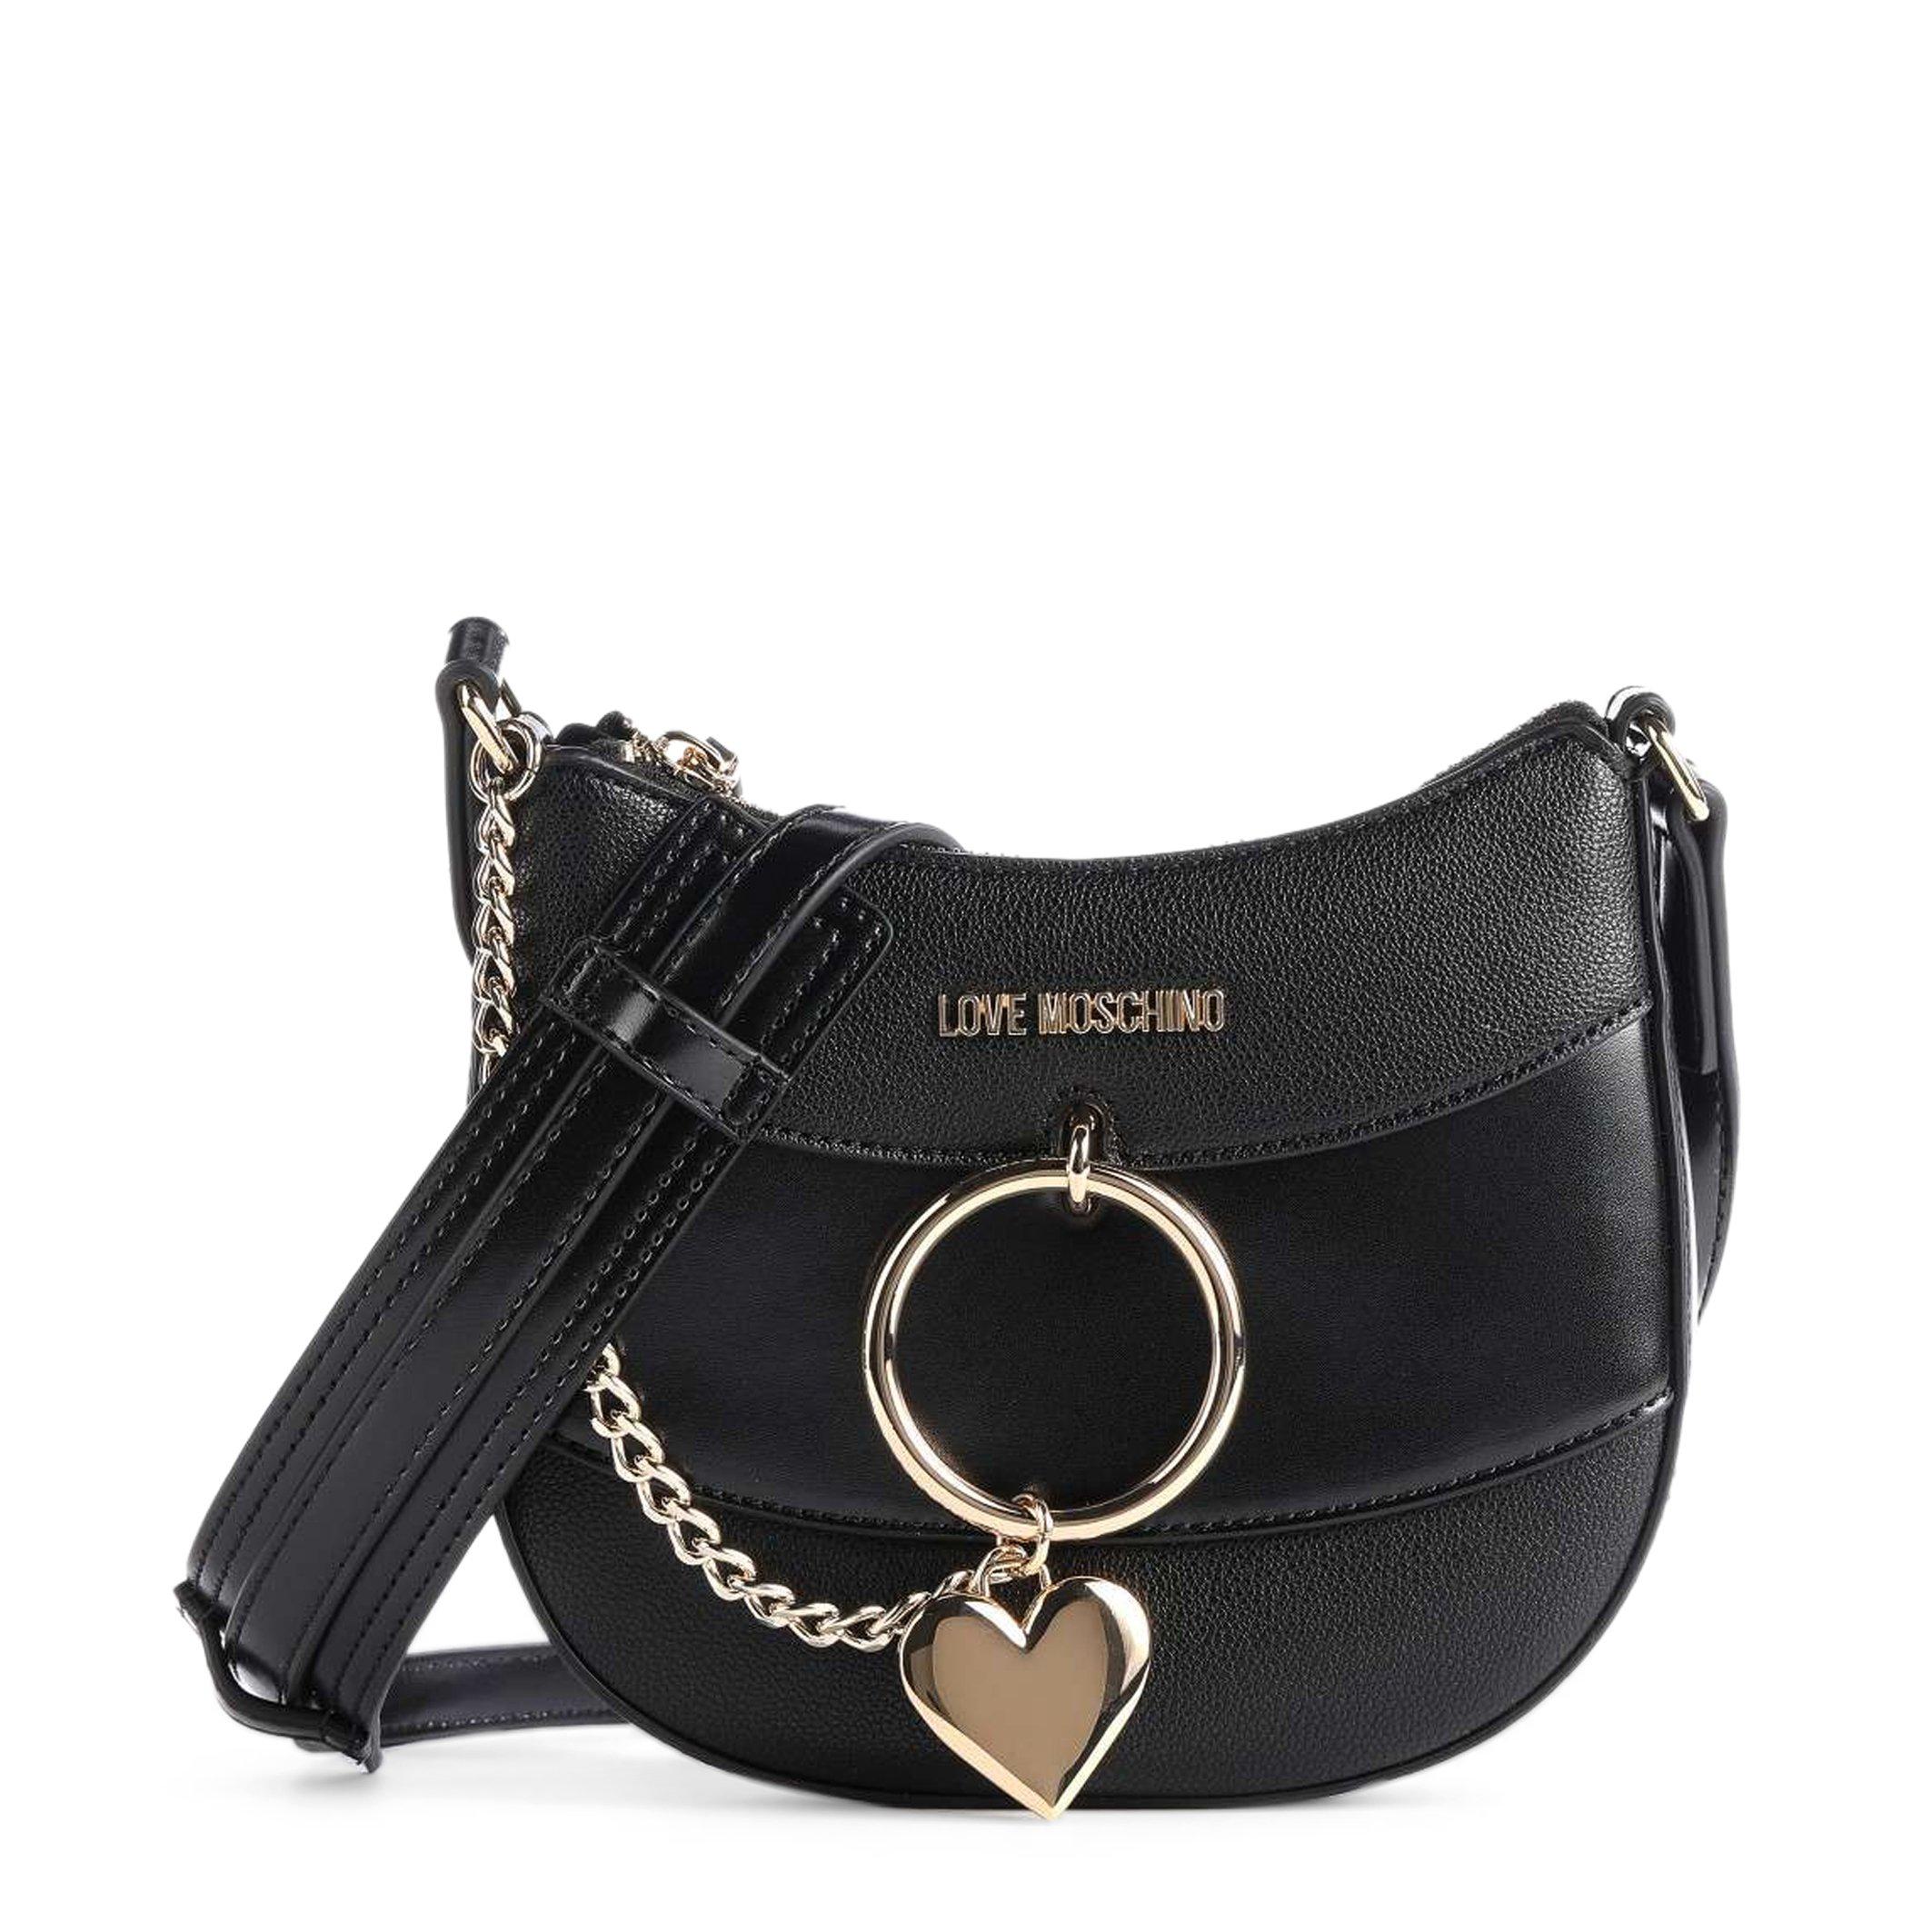 Love Moschino Women's Crossbody Bag Various Colours JC4239PP0CKF1 - black NOSIZE